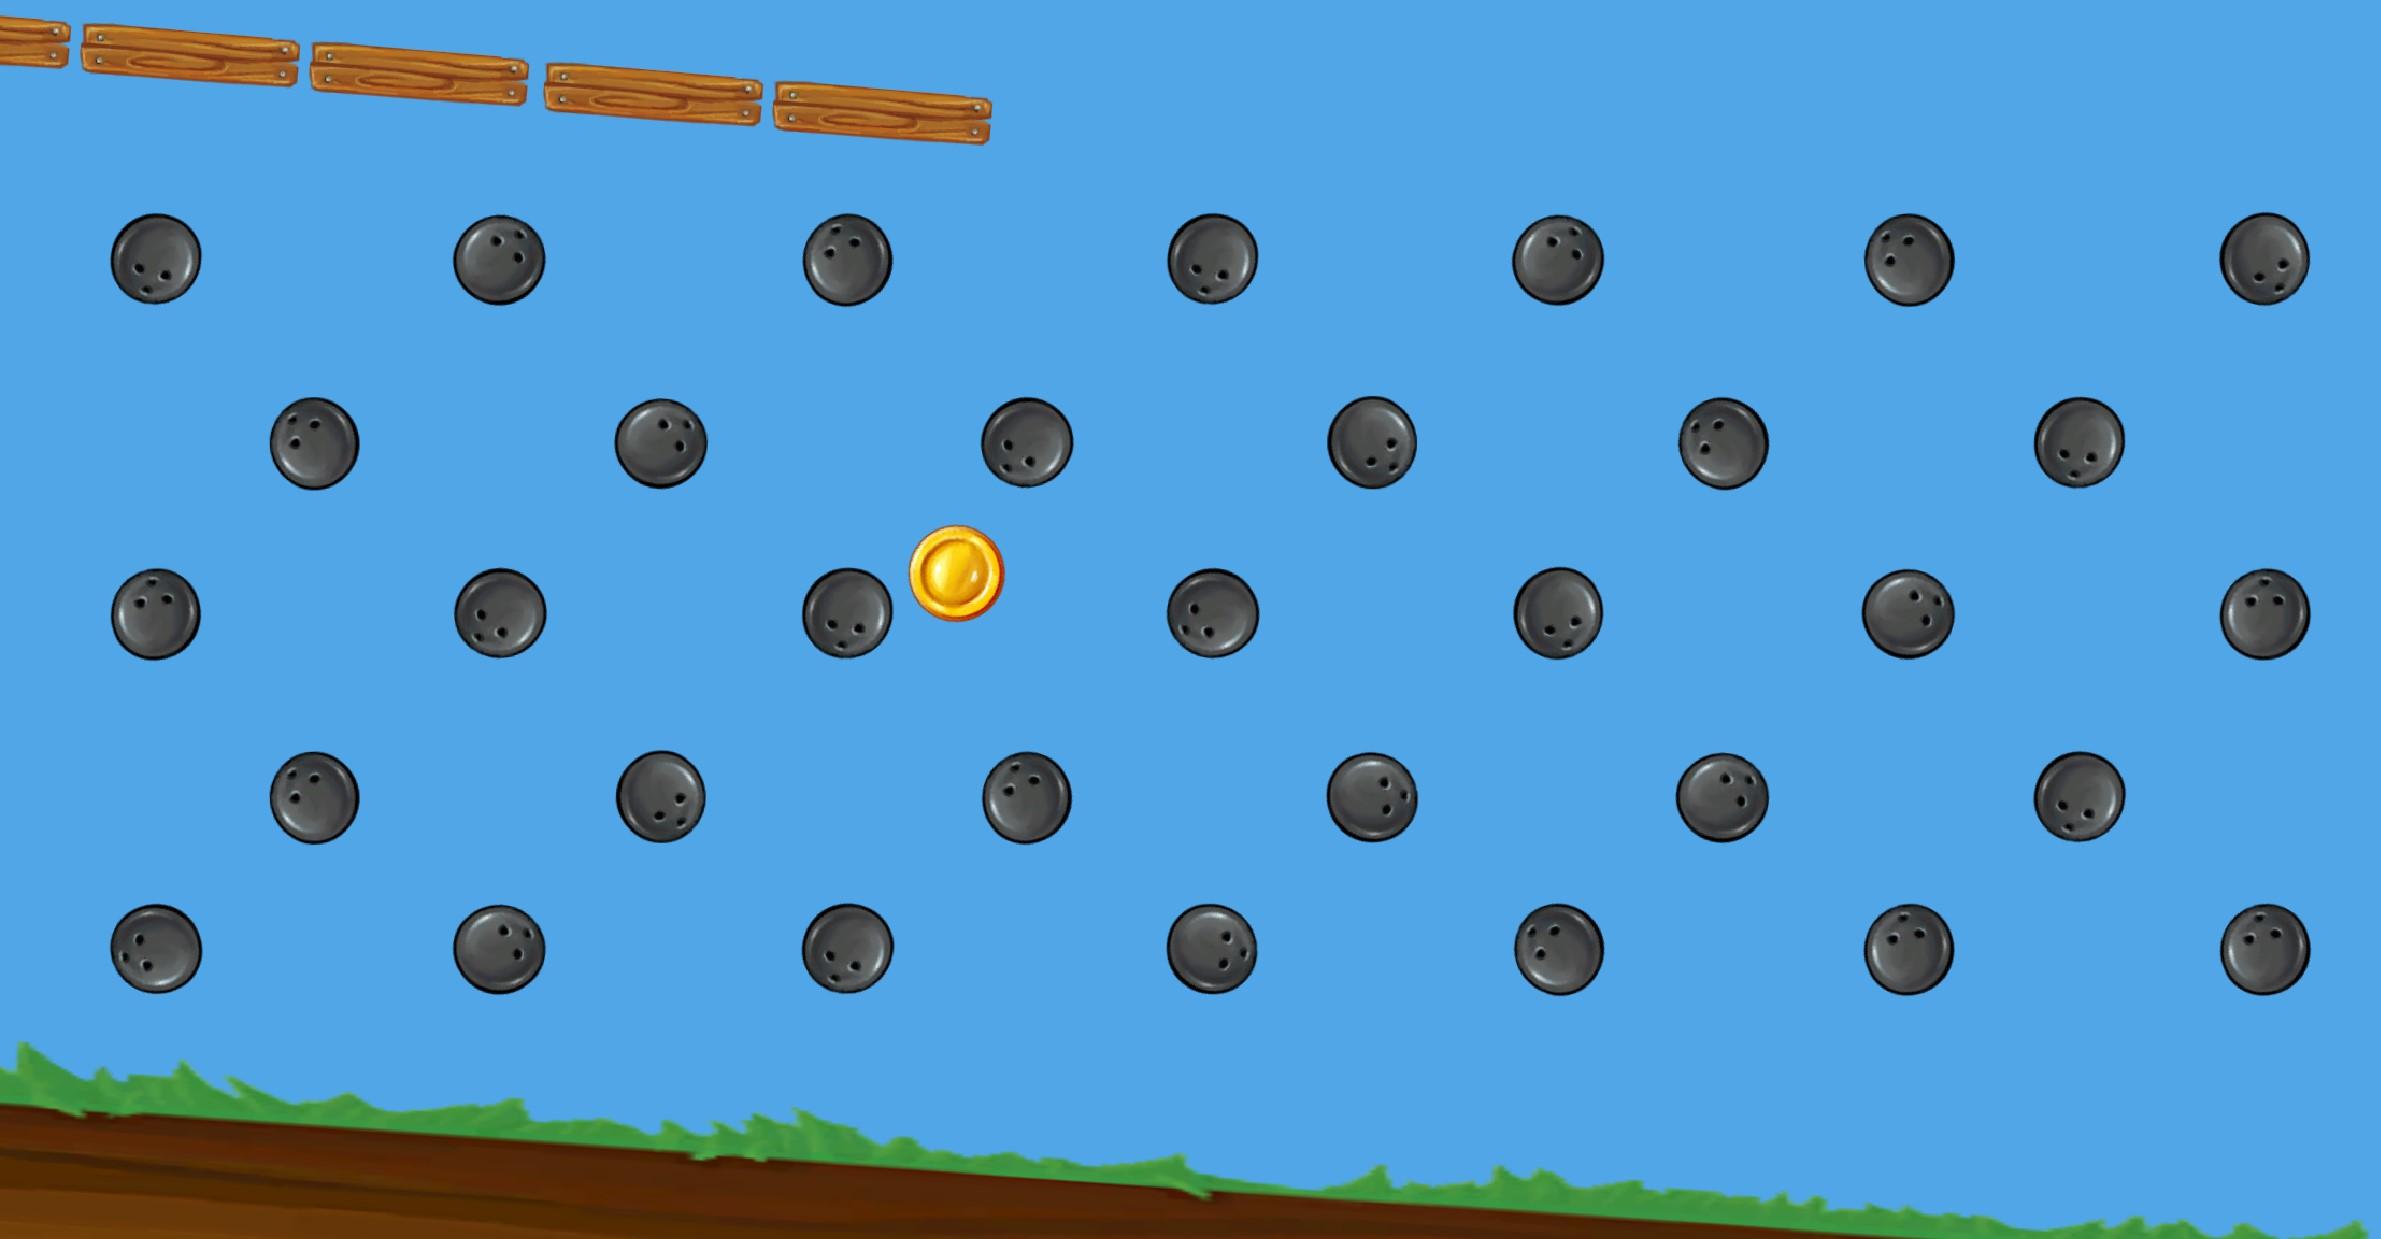 Coin Among Bowling Balls